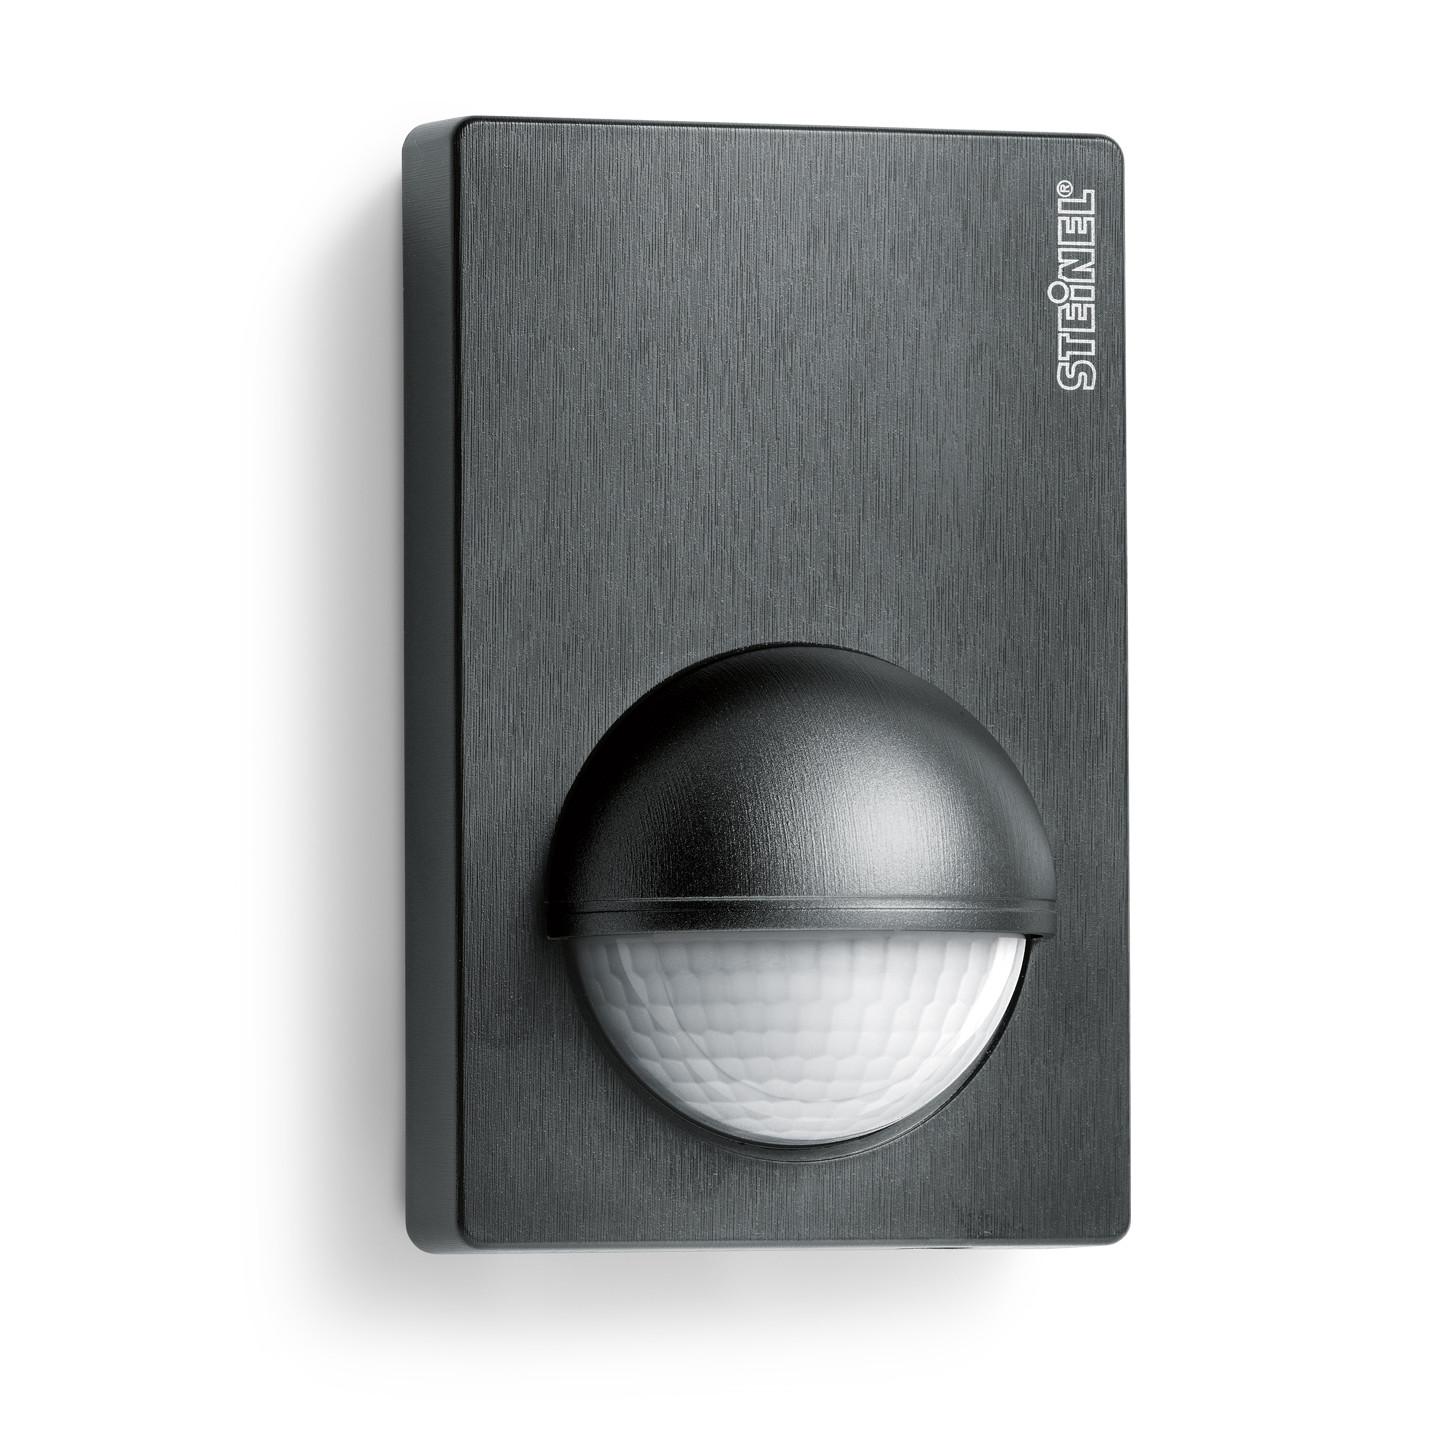 is180-2-wall-pir-sensor-black Elegantes Steinel Ir 180 Up Dekorationen